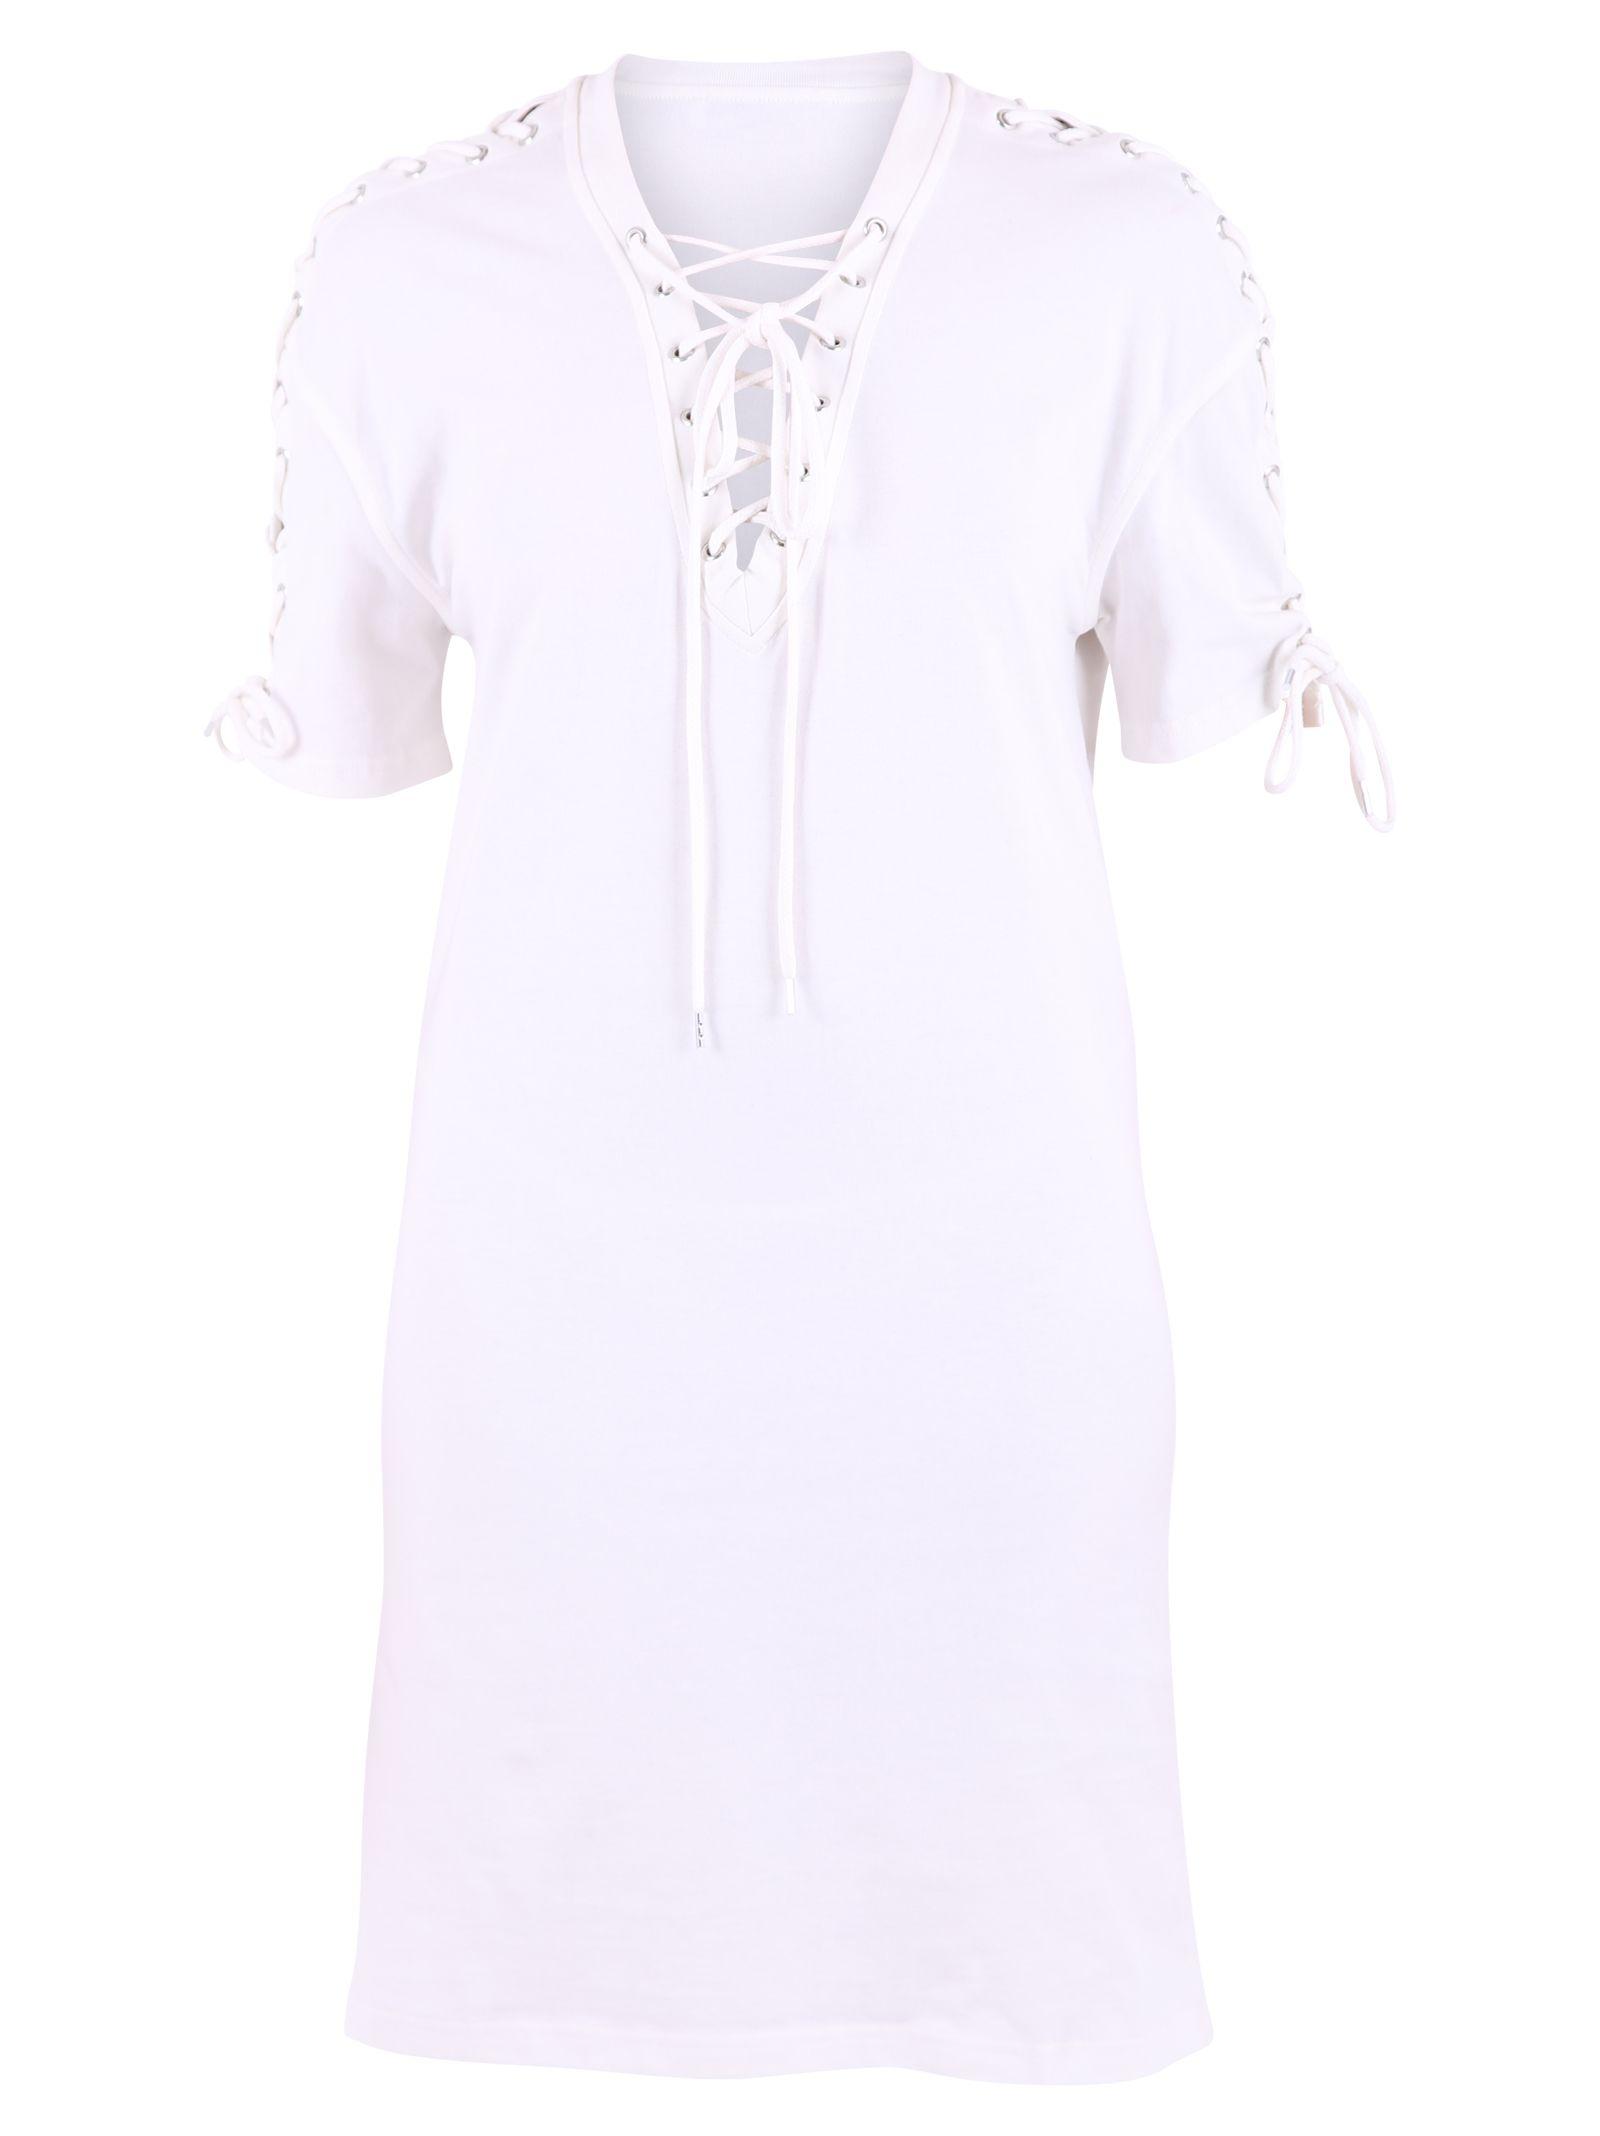 White Lace-up Detail Dress 10575185